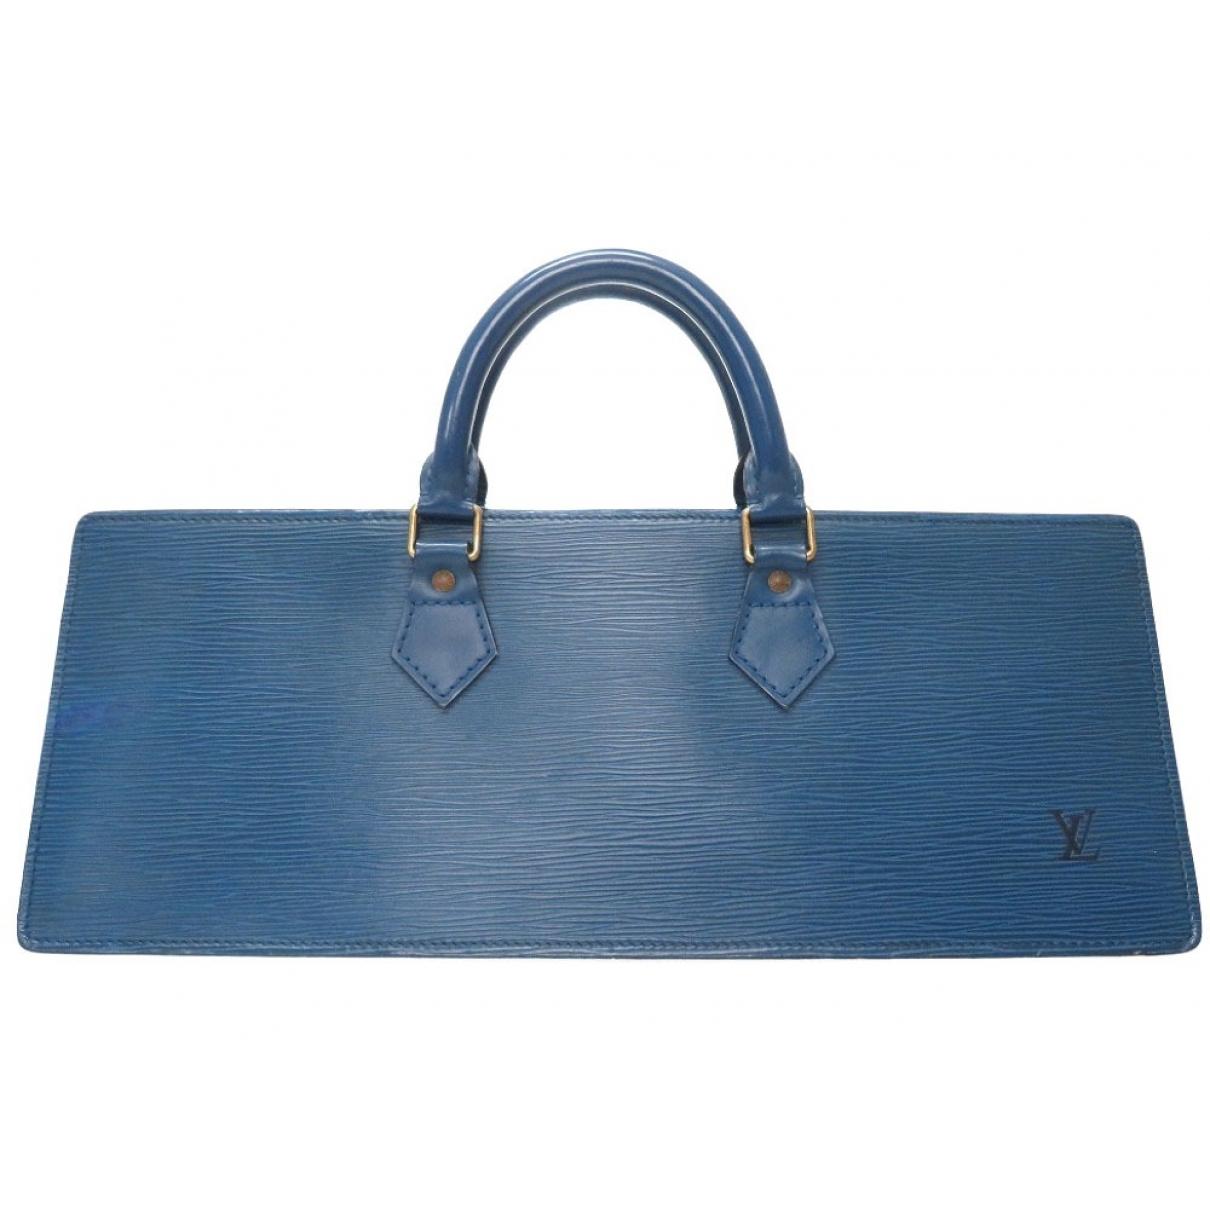 Louis Vuitton - Sac a main Triangle pour femme en cuir - bleu